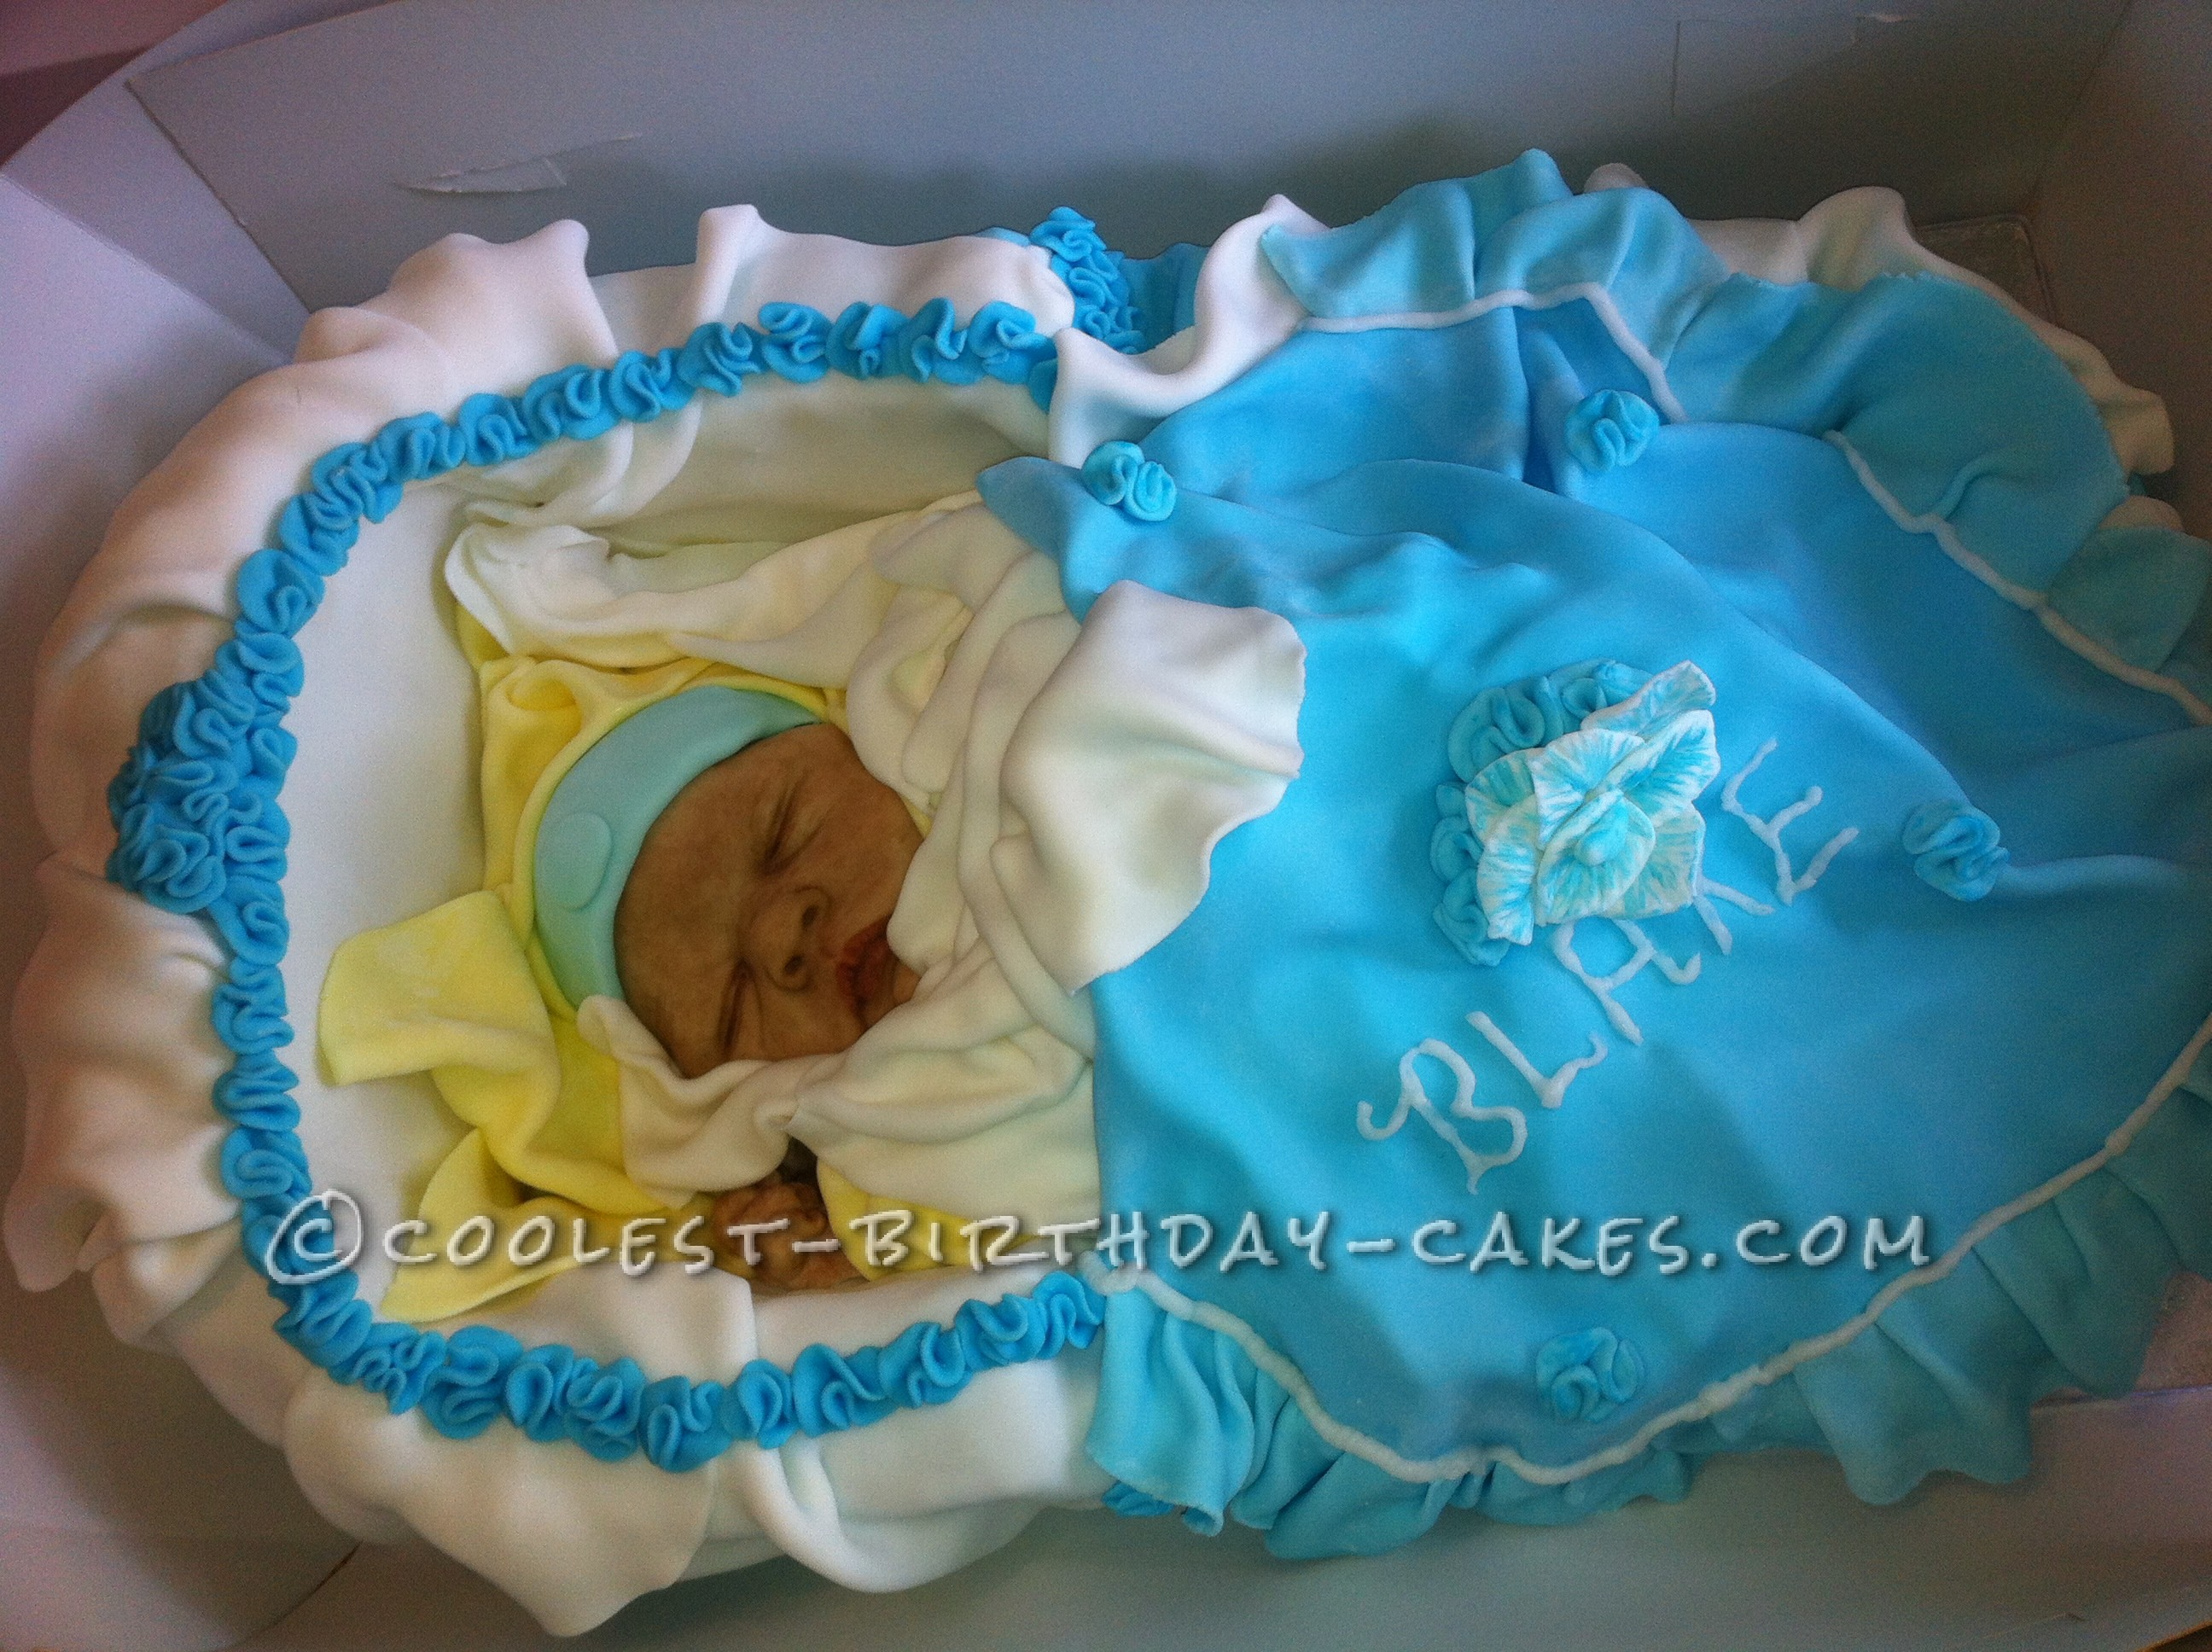 Amazingly Realistic Homemade Baby Cake!